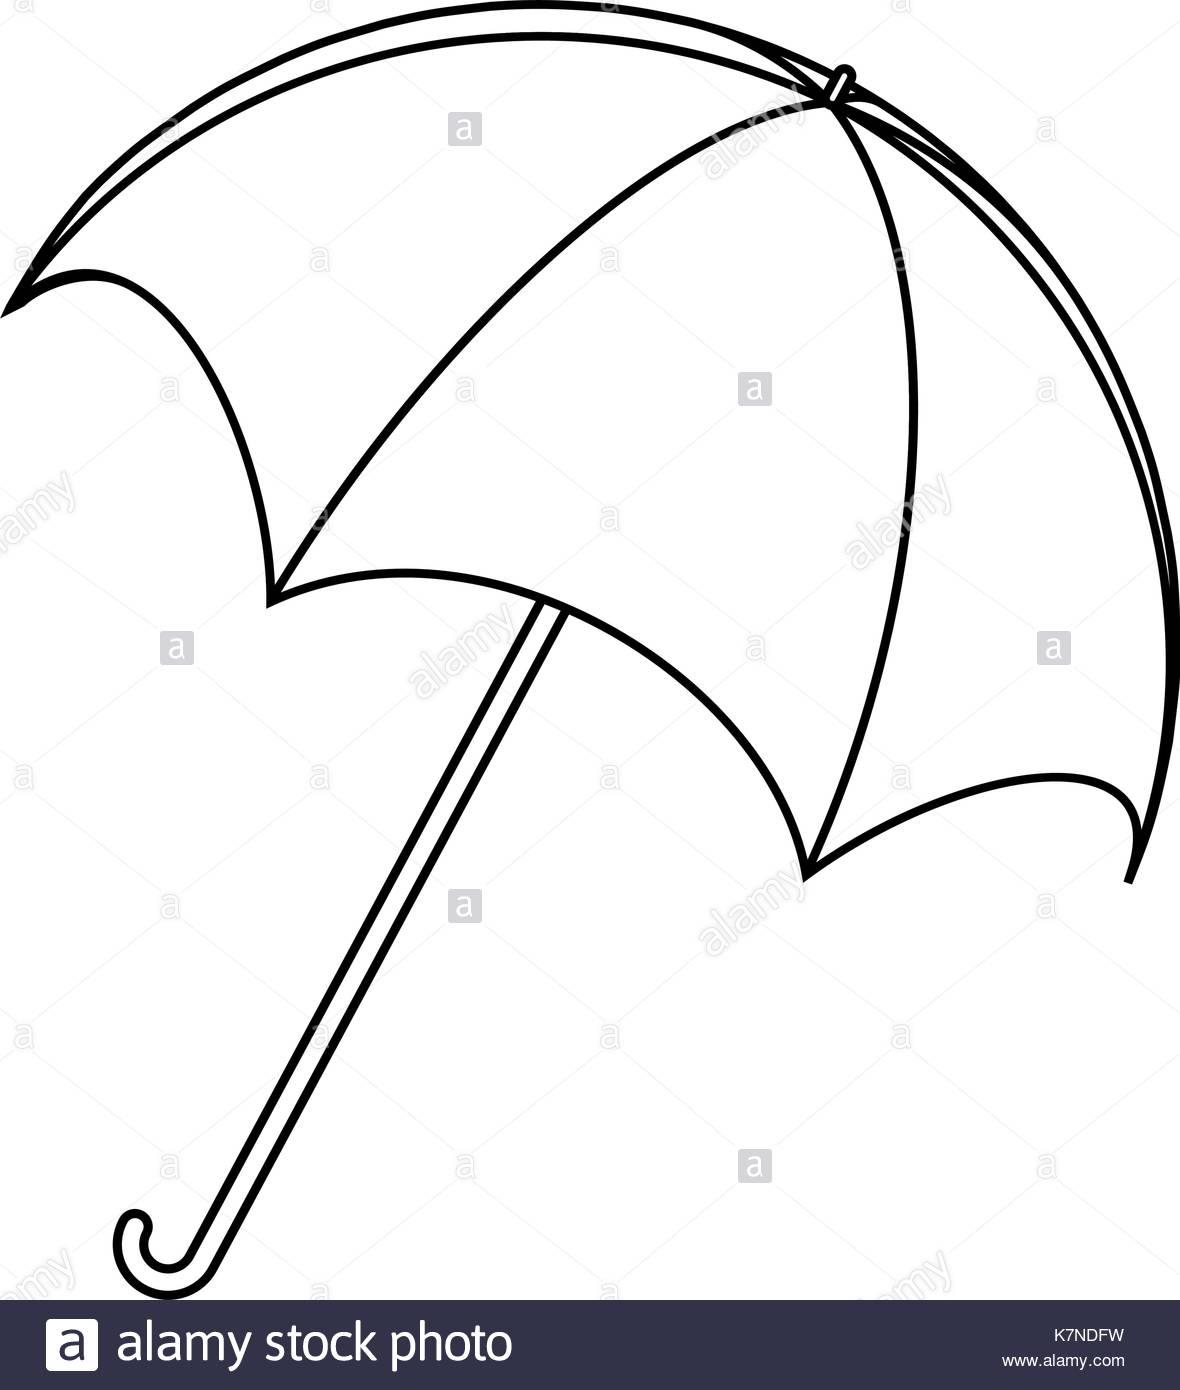 1180x1390 Umbrella Silhouette, Outline Vector Symbol Icon Design. Beautiful